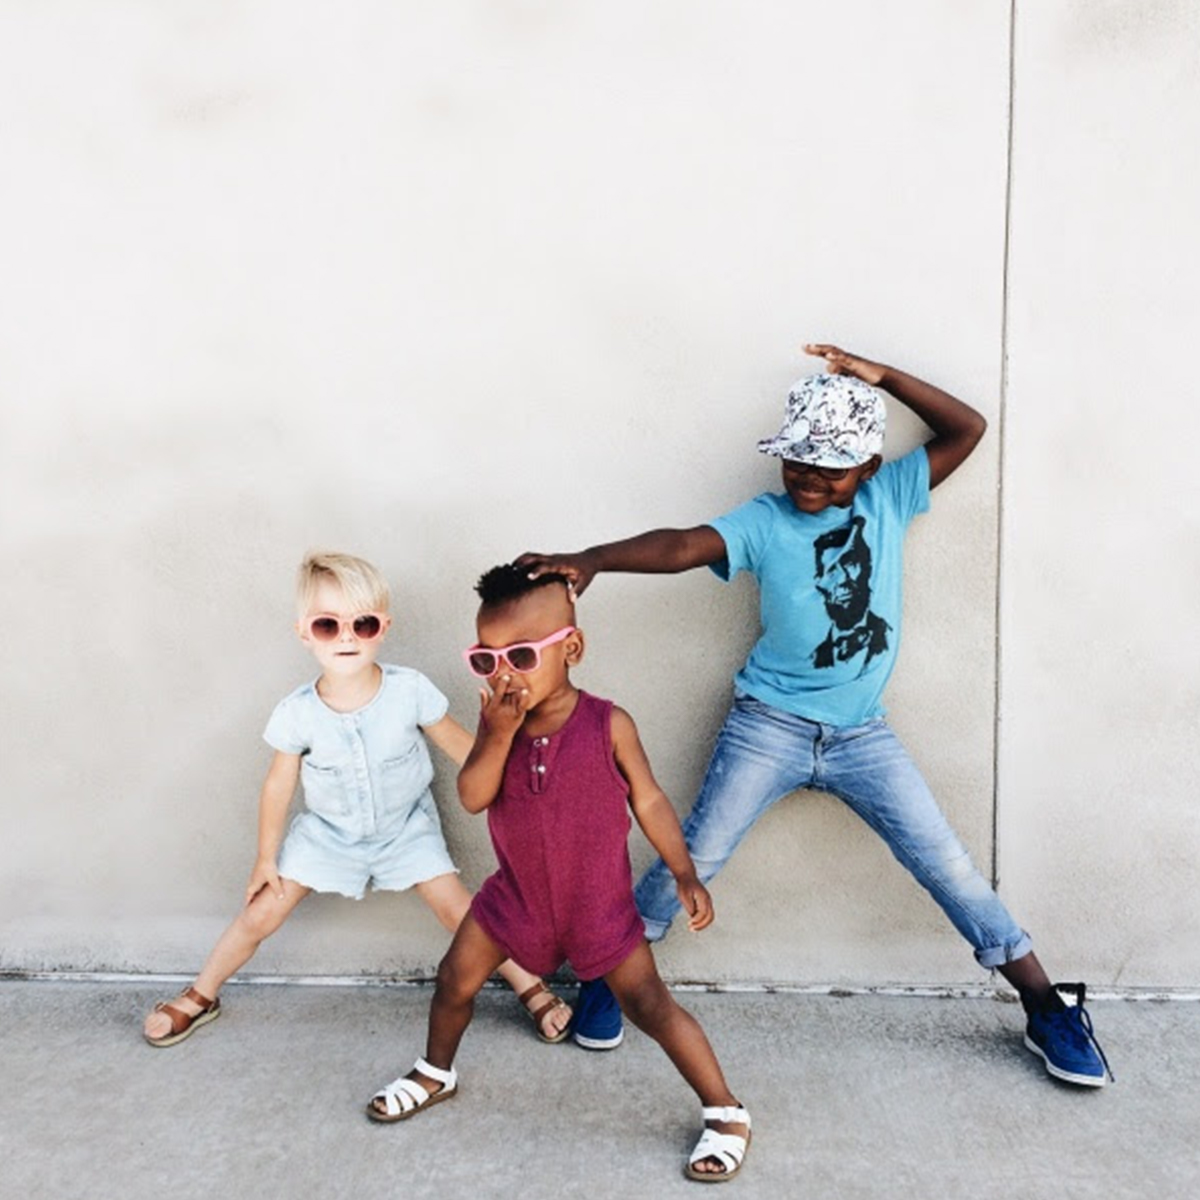 Trio of children in sunglasses striking dance poses